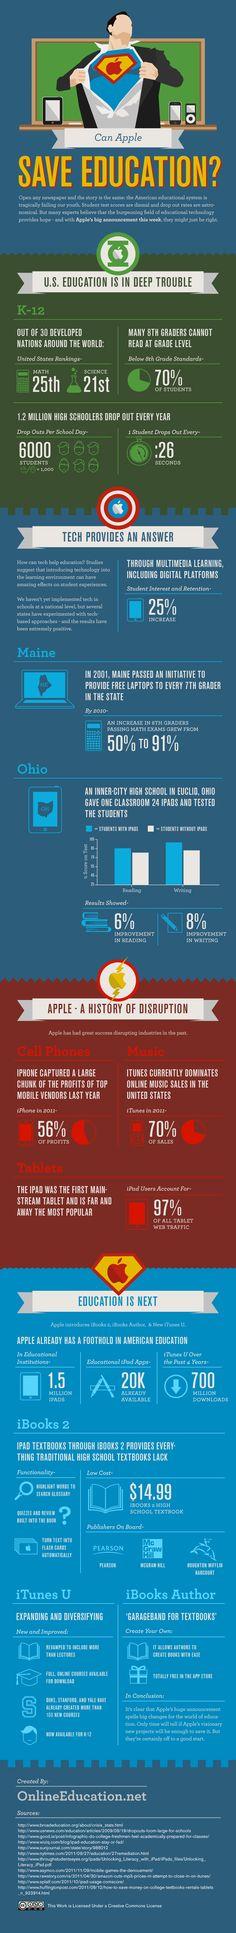 Superhero eLearning infographic